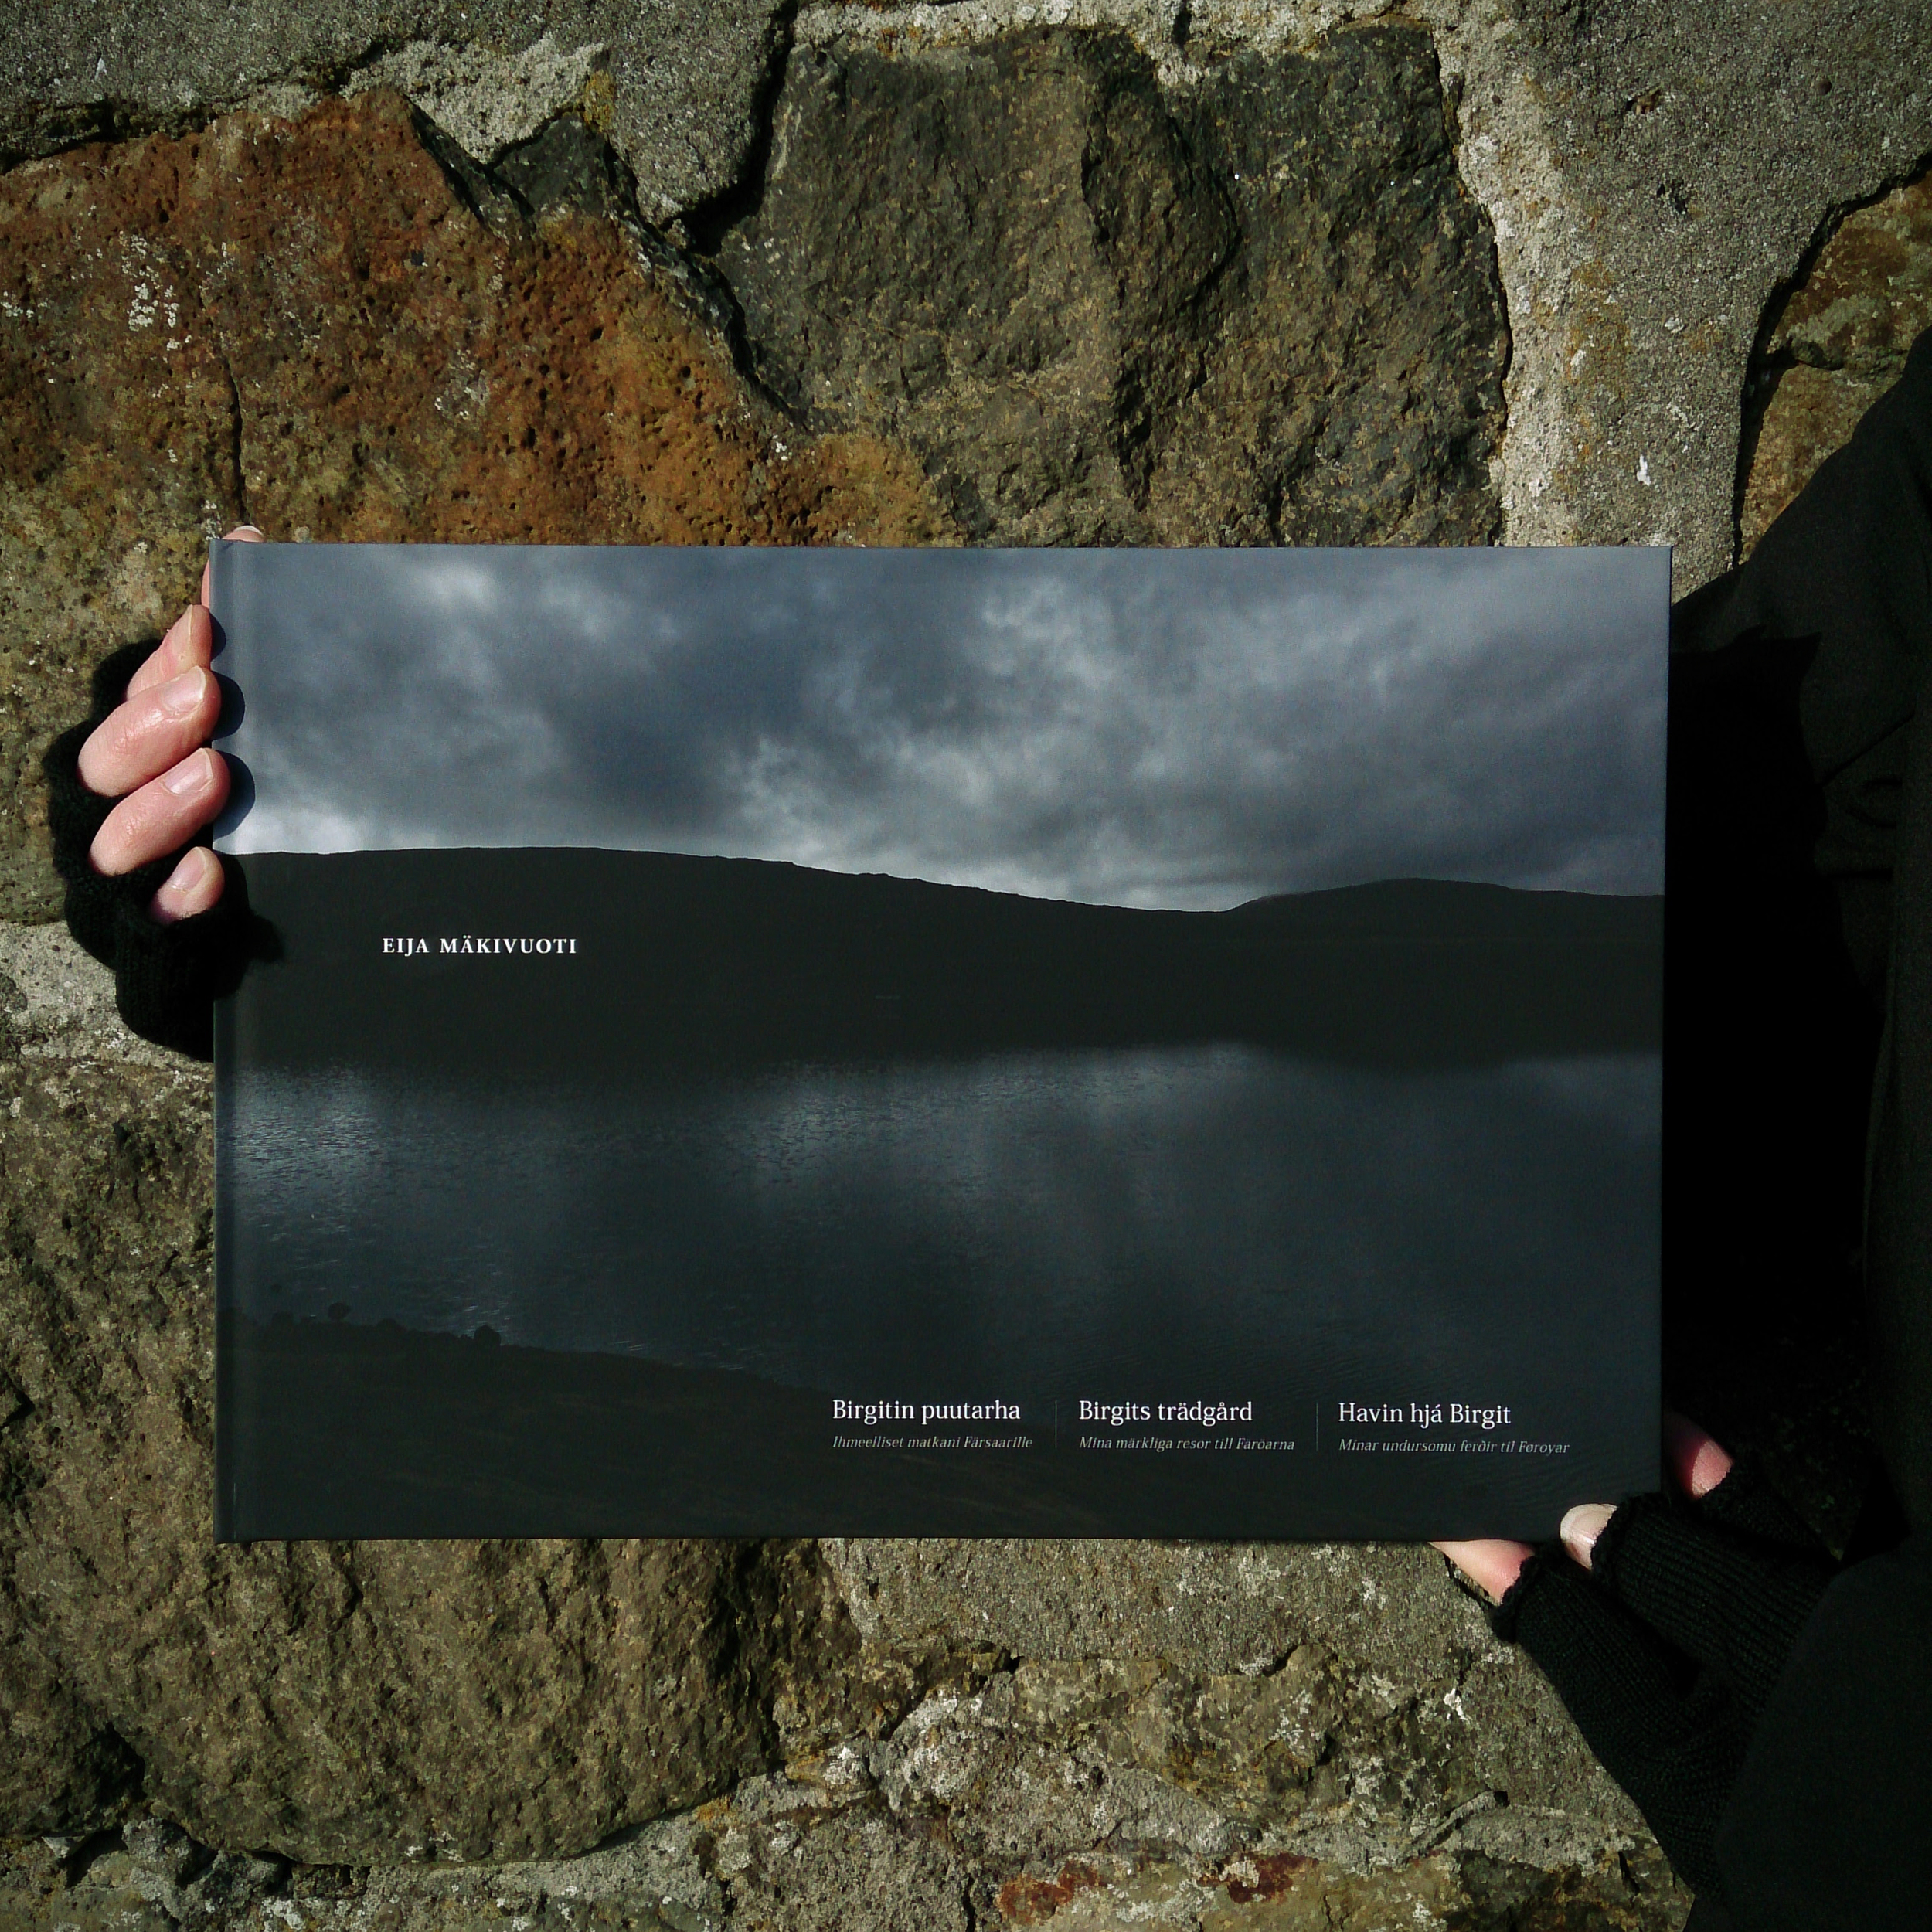 © Eija Mäkivuoti: Birgit's Garden book cover in the sun light of Tórshavn, 2015.  BIRGIT'S GARDEN, BIRGITIN PUUTARHA, BIRGITS TRÄDGÅRD, HAVIN HJÁ BIRGIT  My Wondrous Journeys to the Faroe Islands, Ihmeelliset matkani Färsaarille, Mina märkliga resor till Färöarna, Mínar undursomu ferðir til Føroyar    A Nordic photo book about the Faroe Islands by Eija Mäkivuoti.